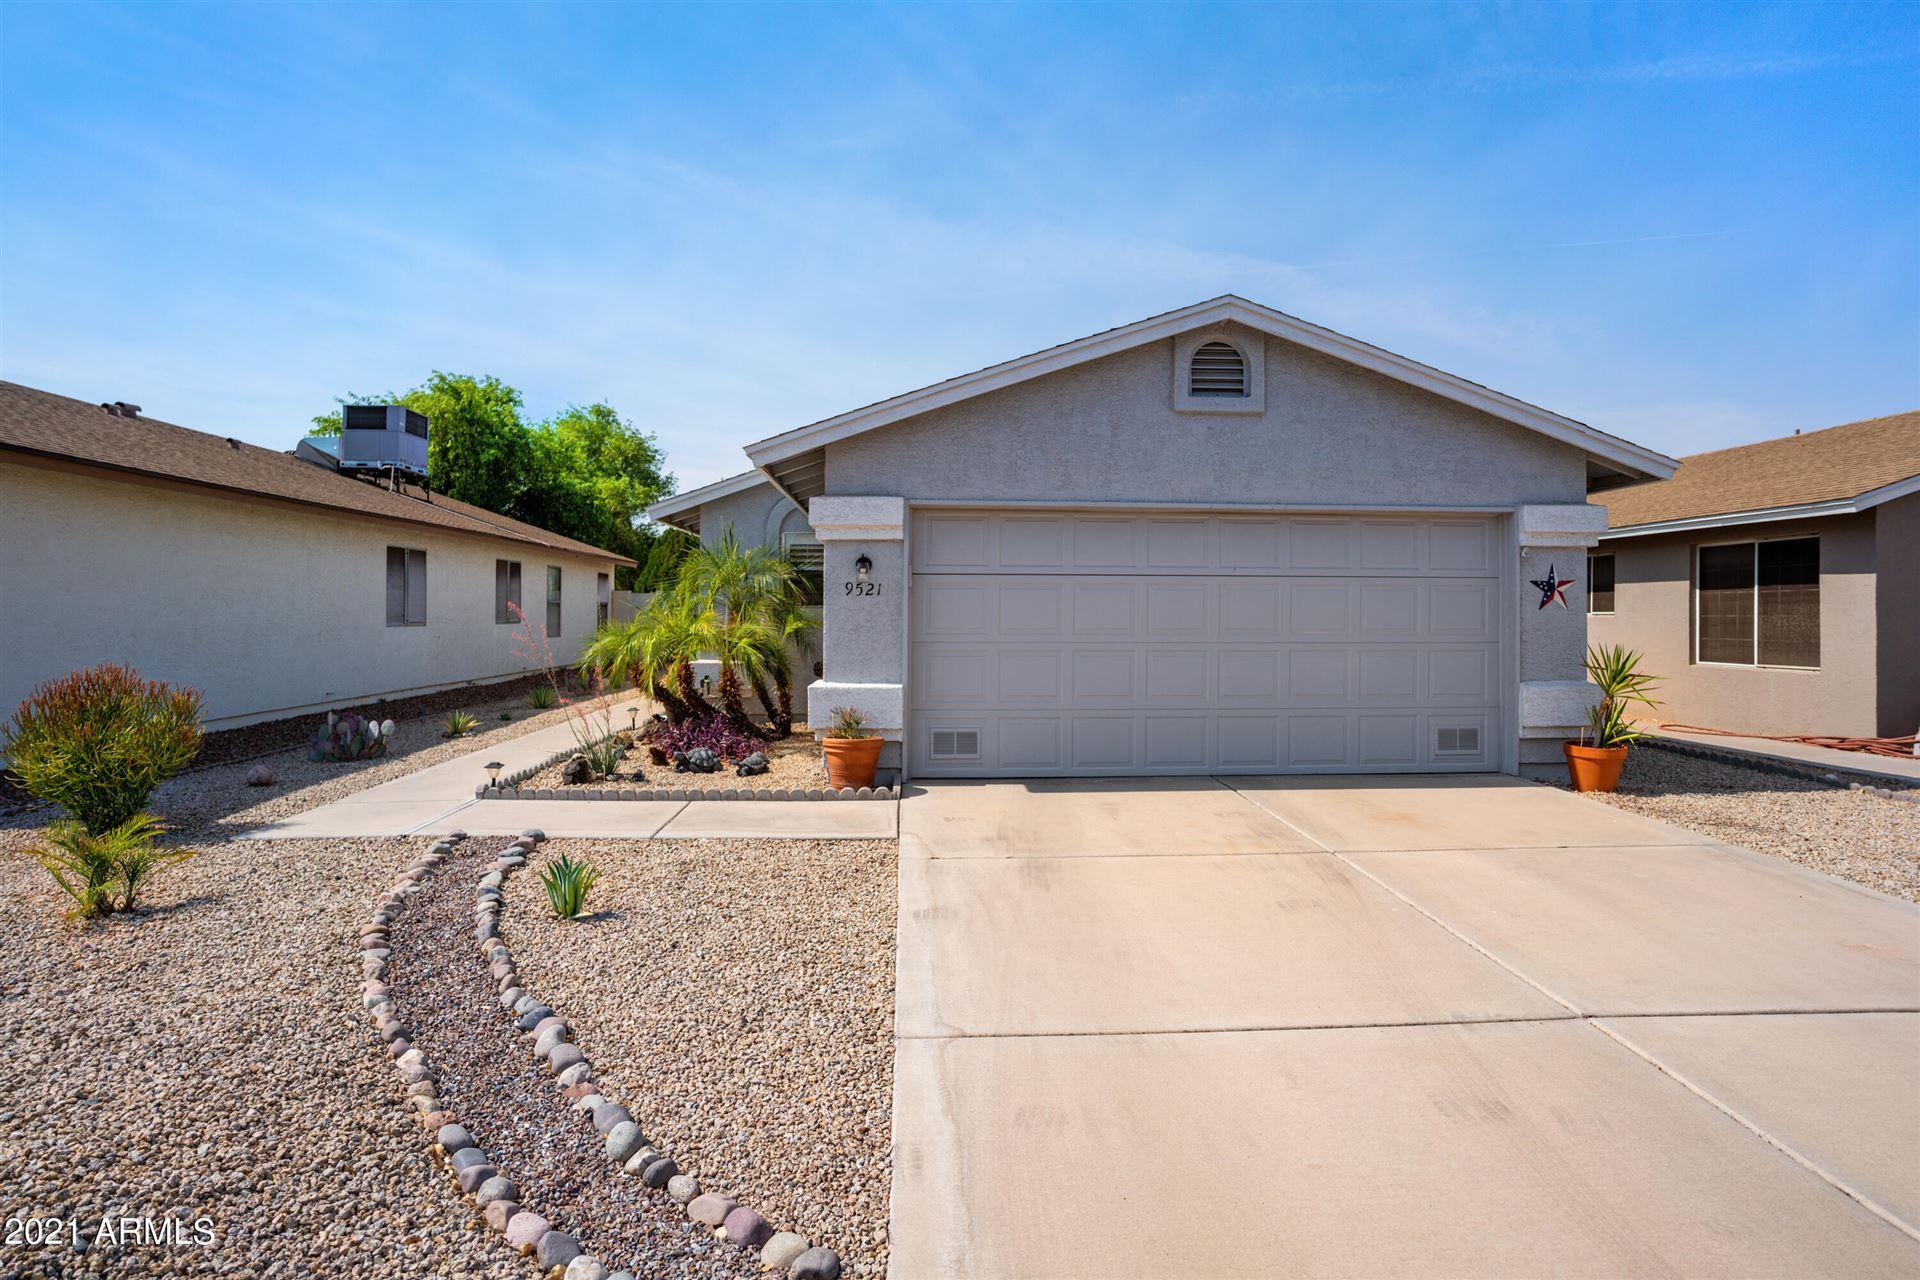 Photo of 9521 W CAROL Avenue, Peoria, AZ 85345 (MLS # 6249622)